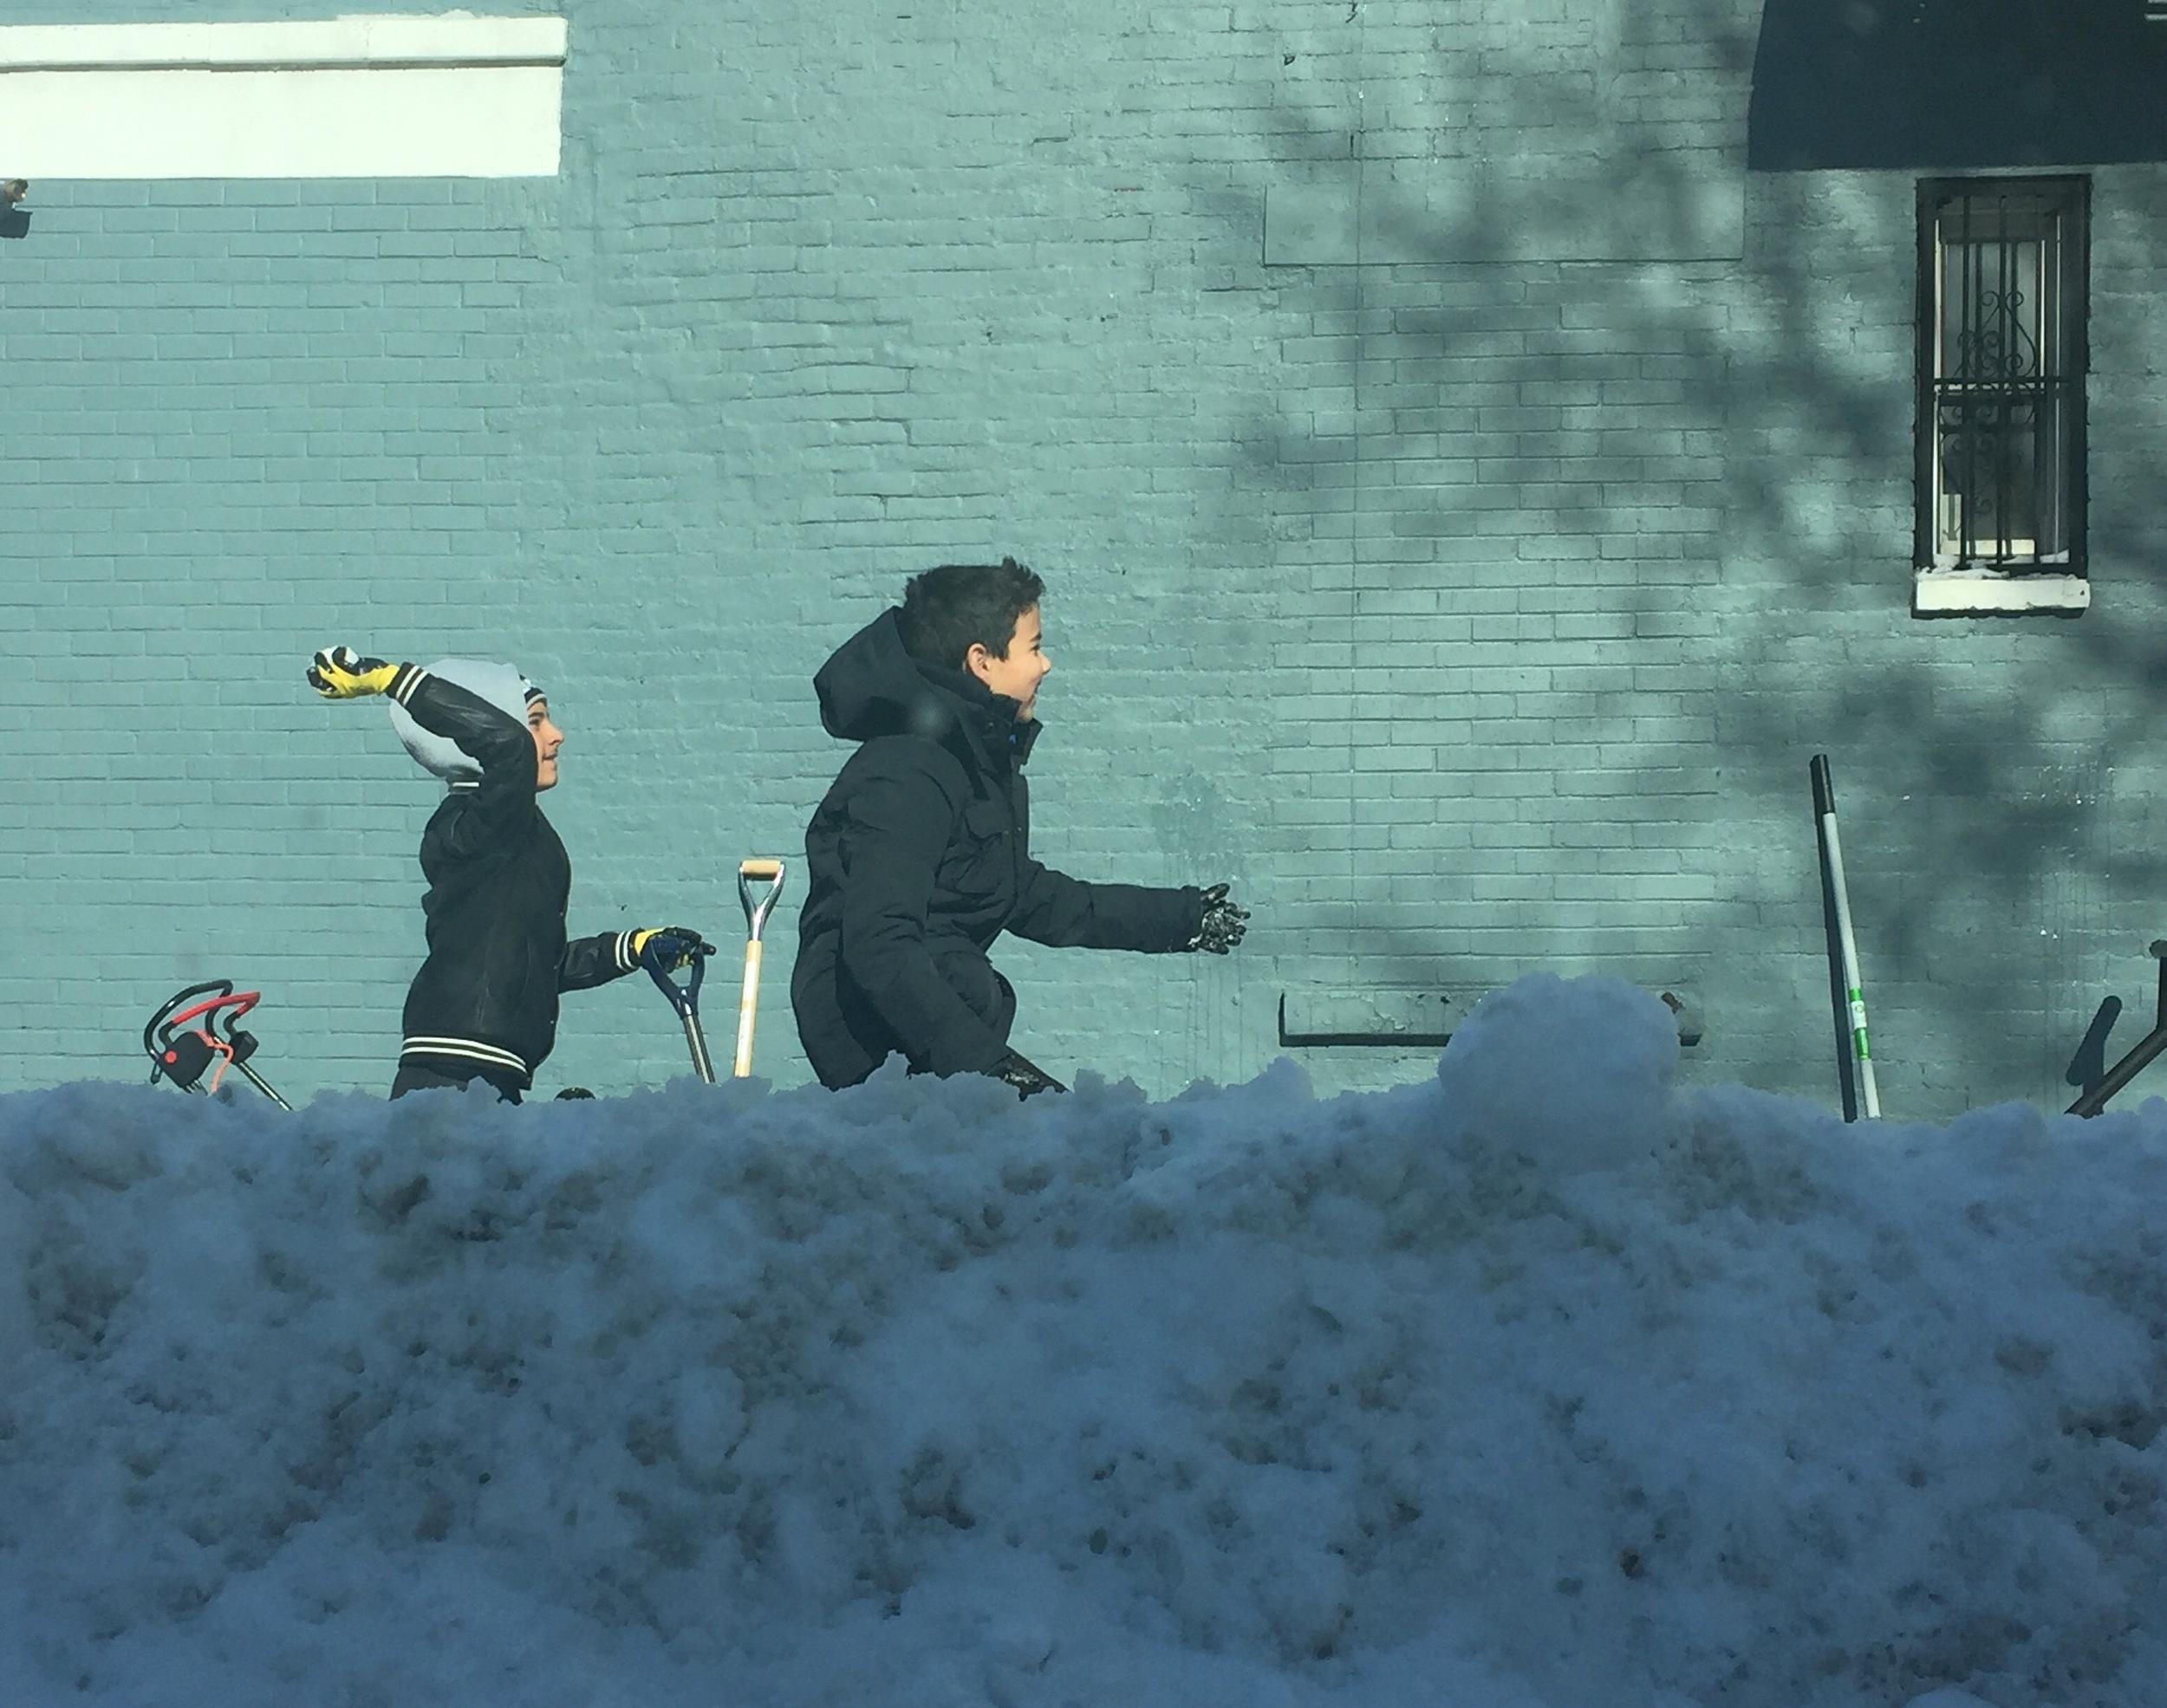 Playing in Snowzilla